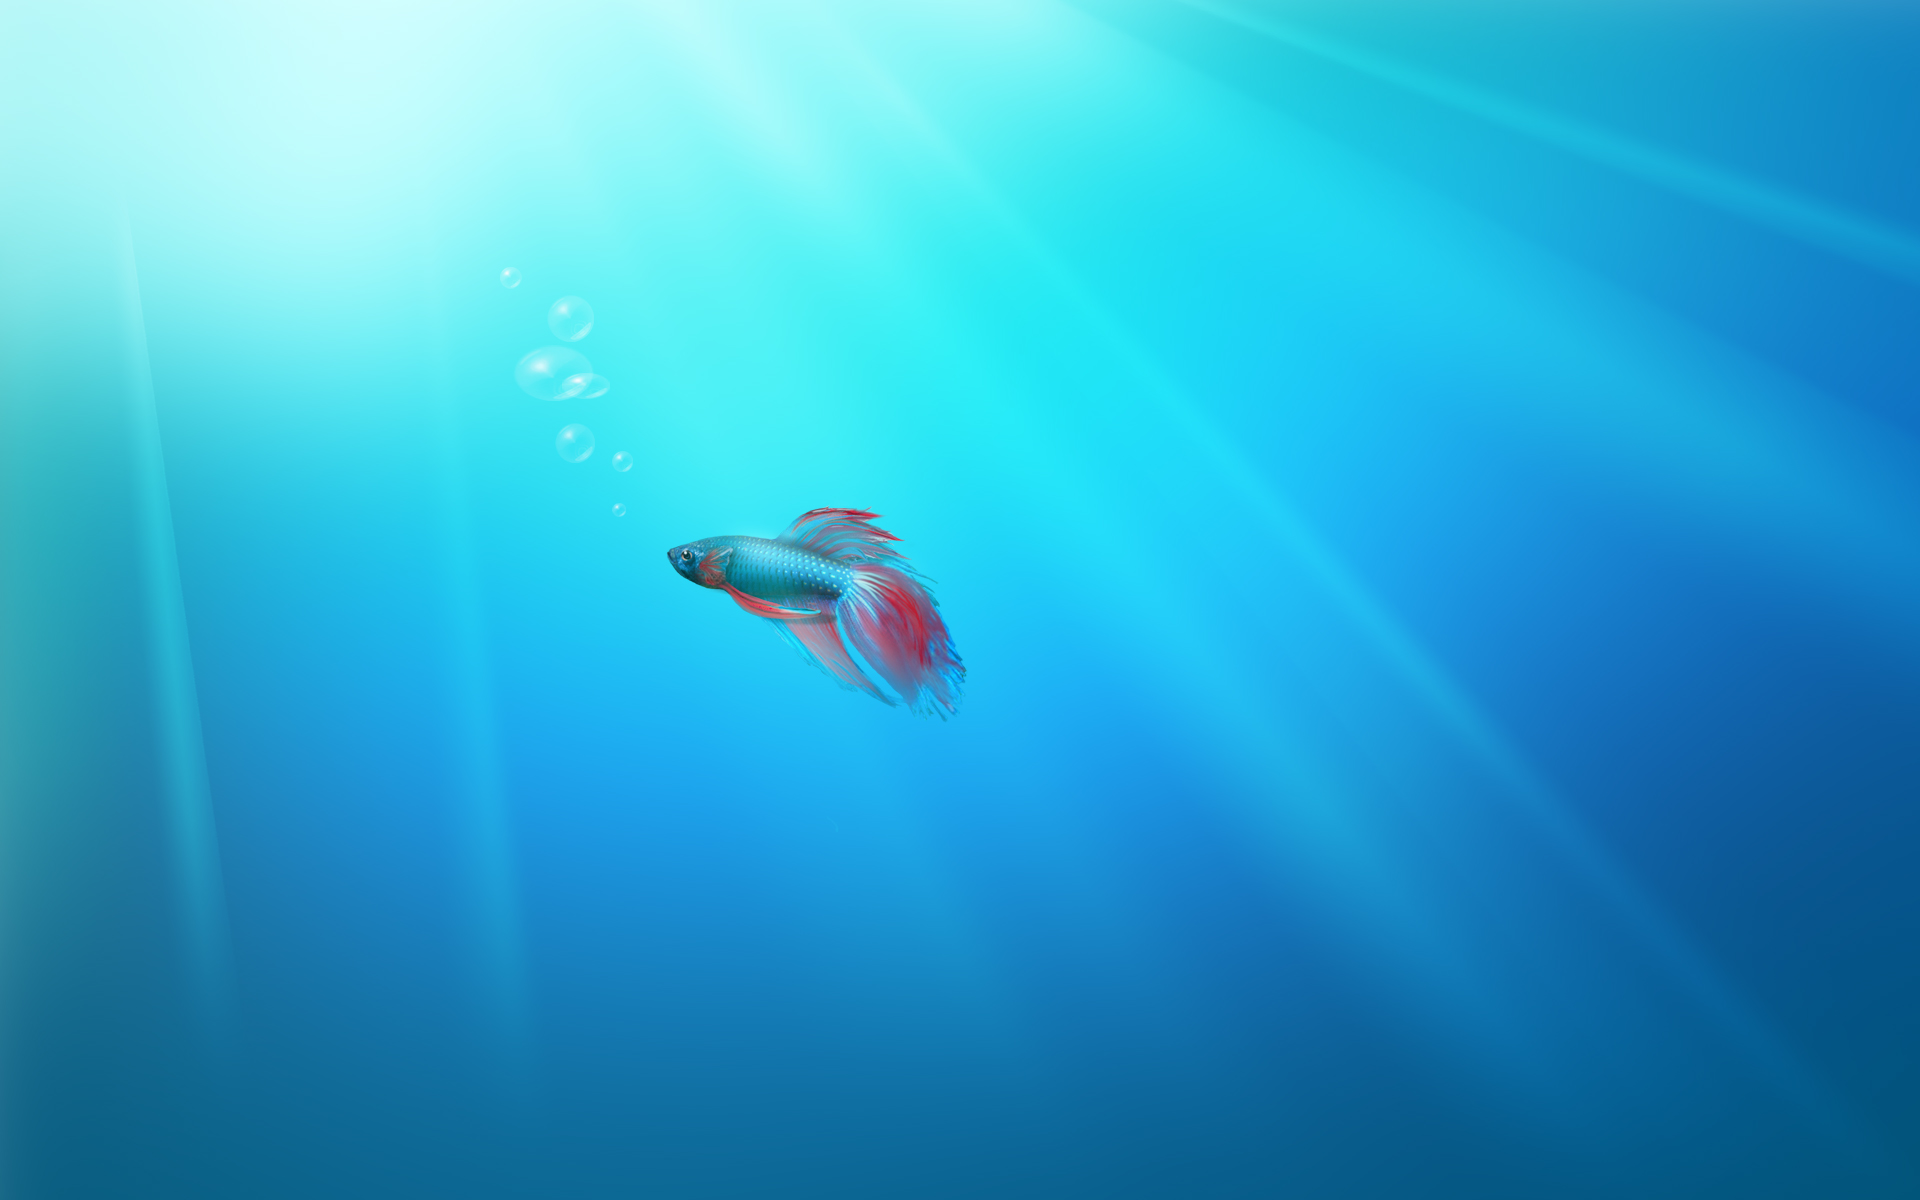 Windows 7 Beta Fish wallpaper   160940 1920x1200